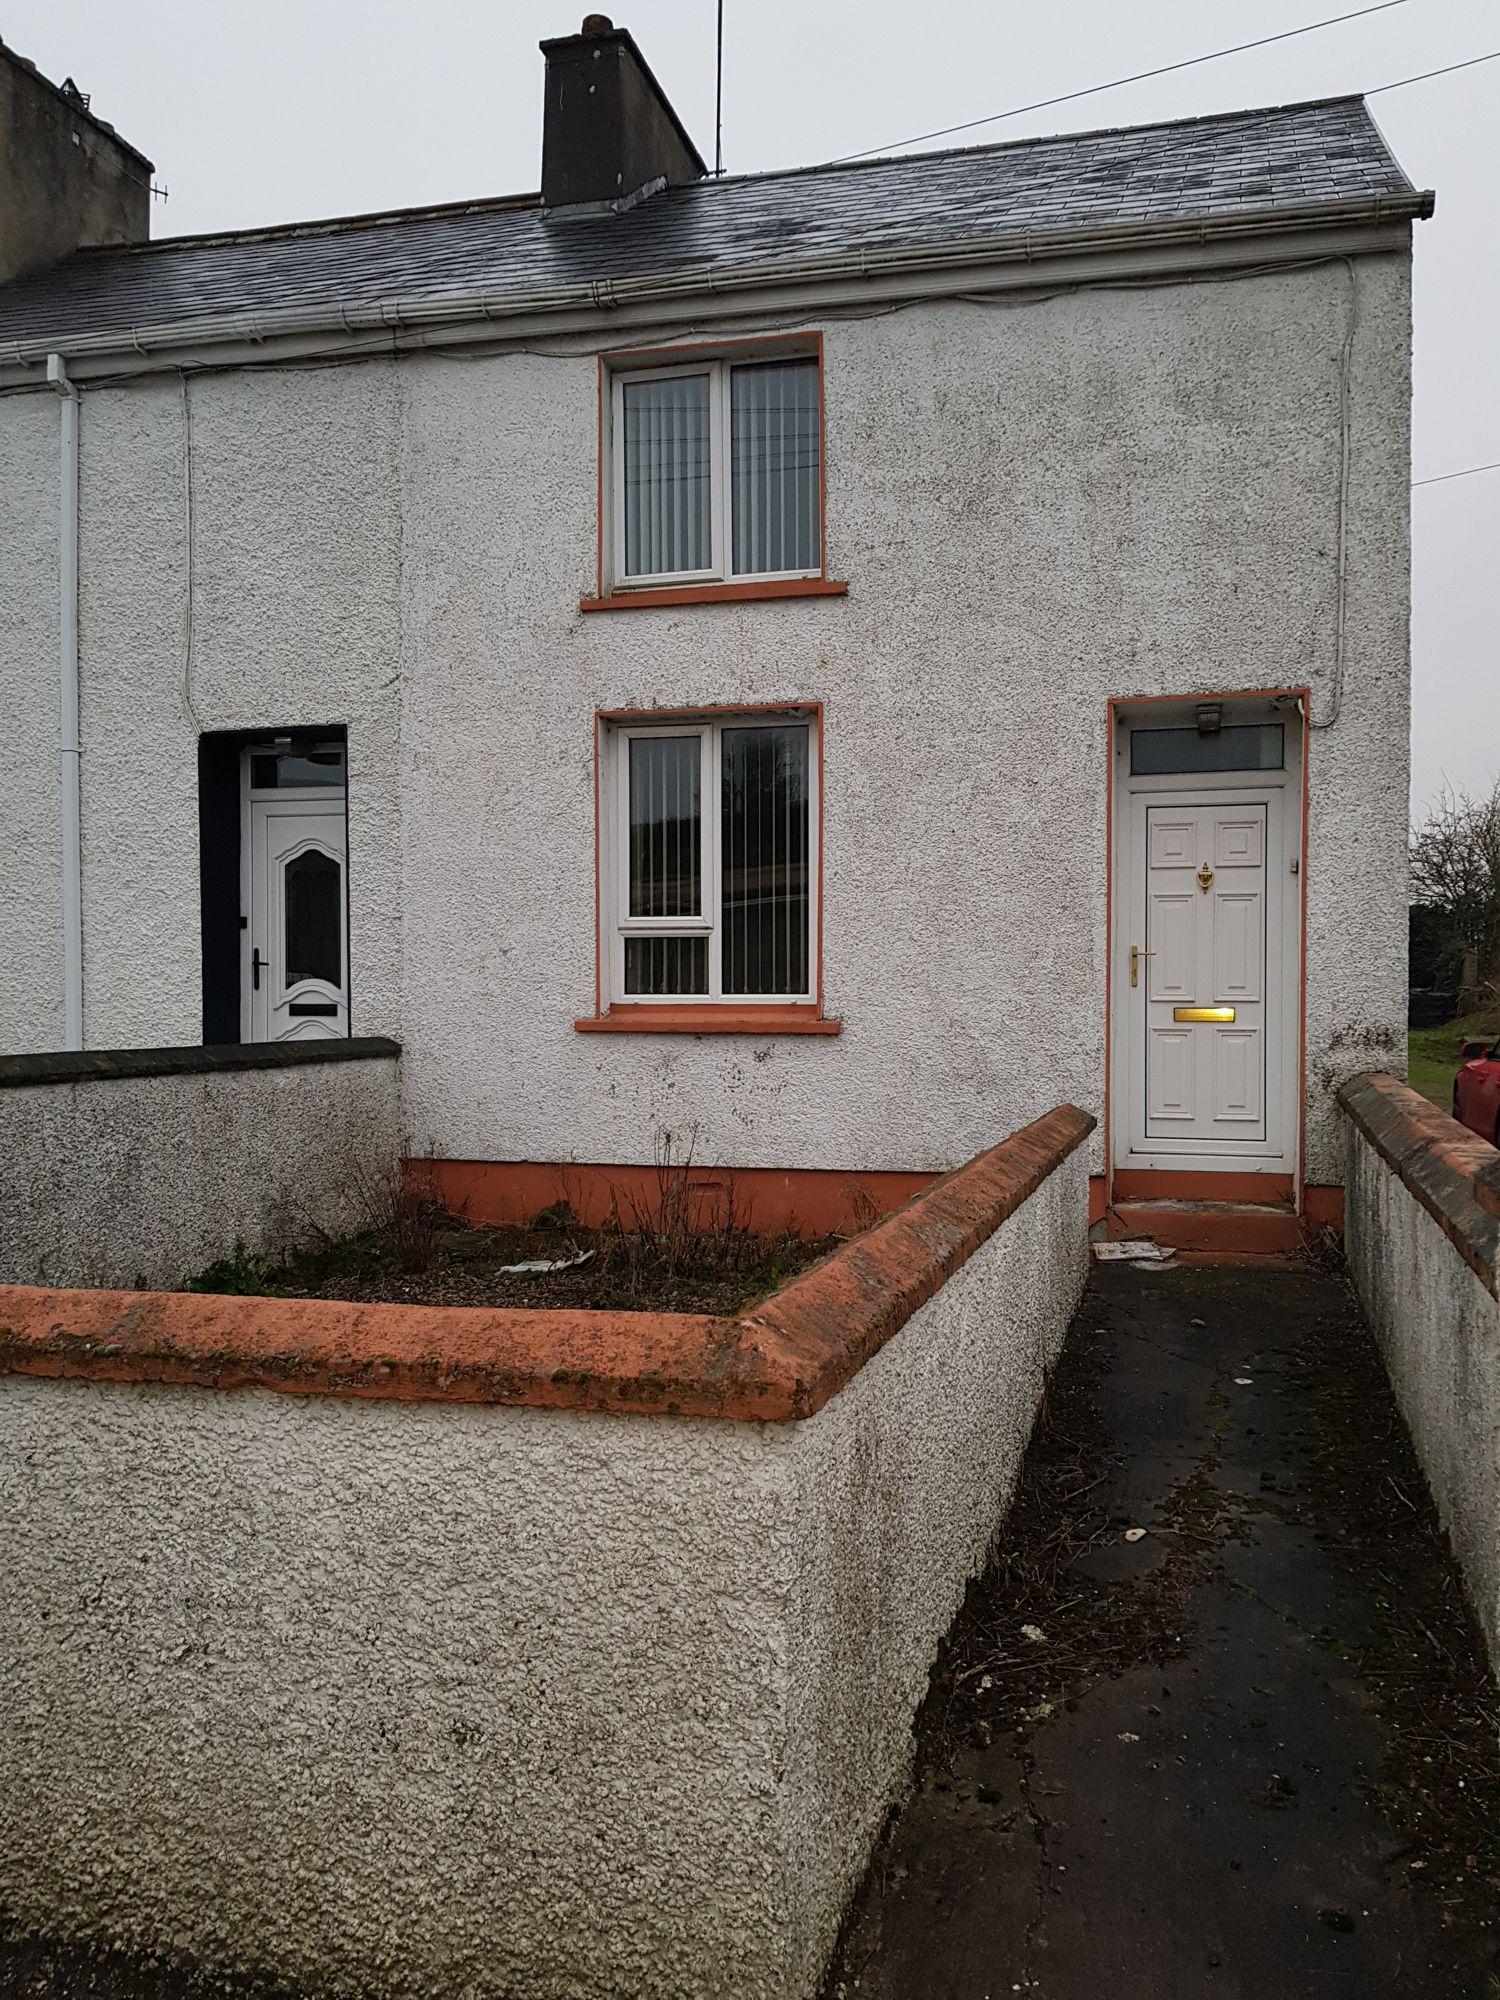 Hillhead, Castlefinn, Co Donegal F93 AXK5